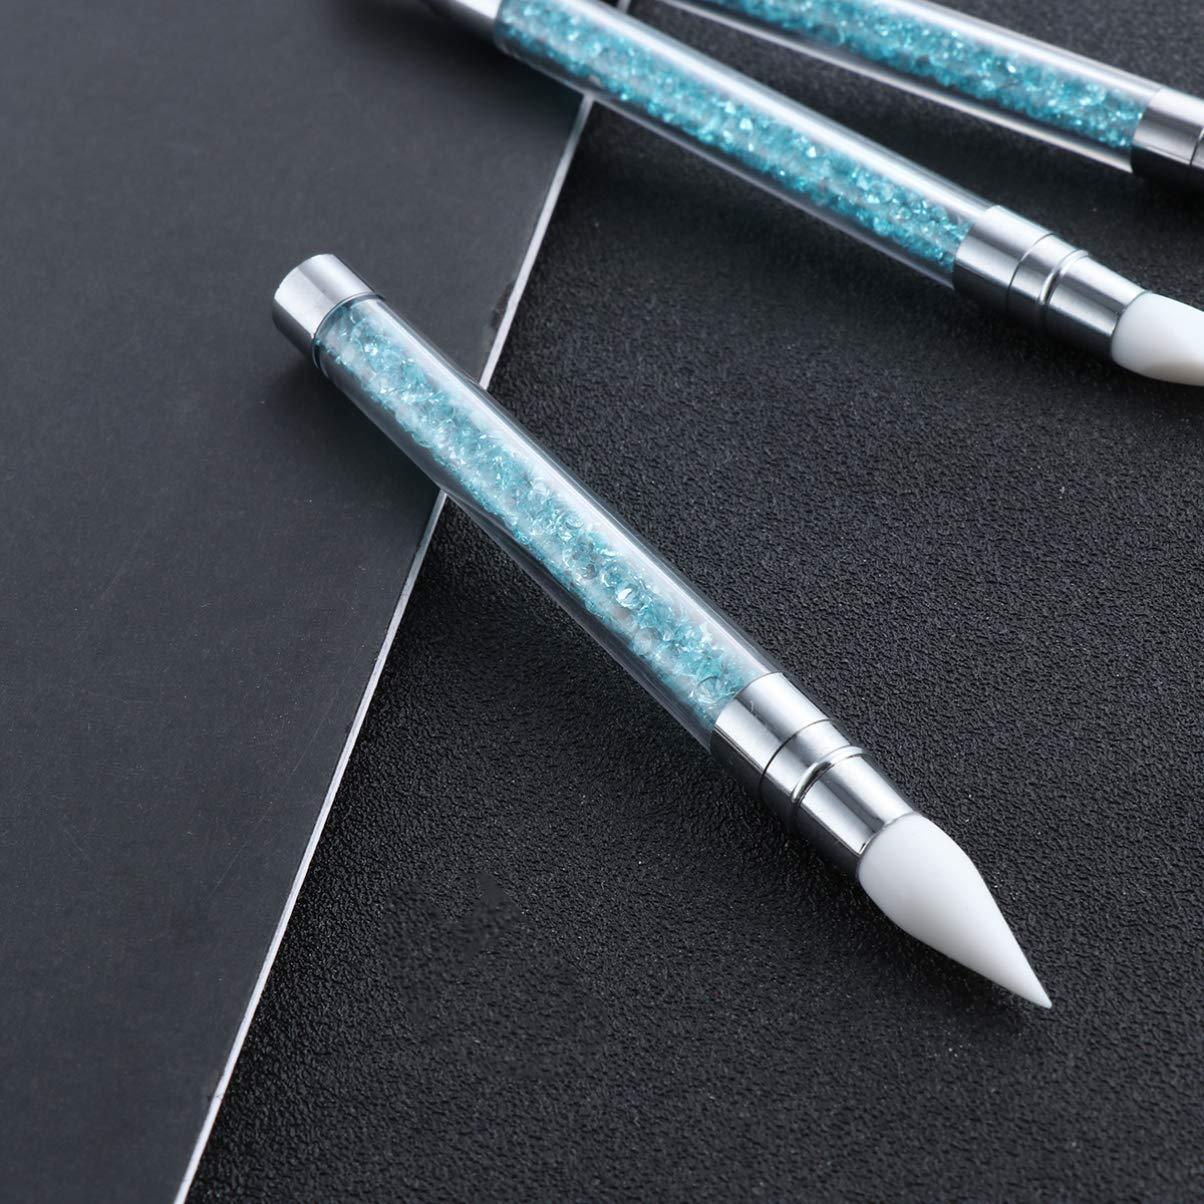 Nail Art Sculpture Pen Set Silicone Double End Handle Nail Brush Manicure Tool 3pcs (Sky Blue)